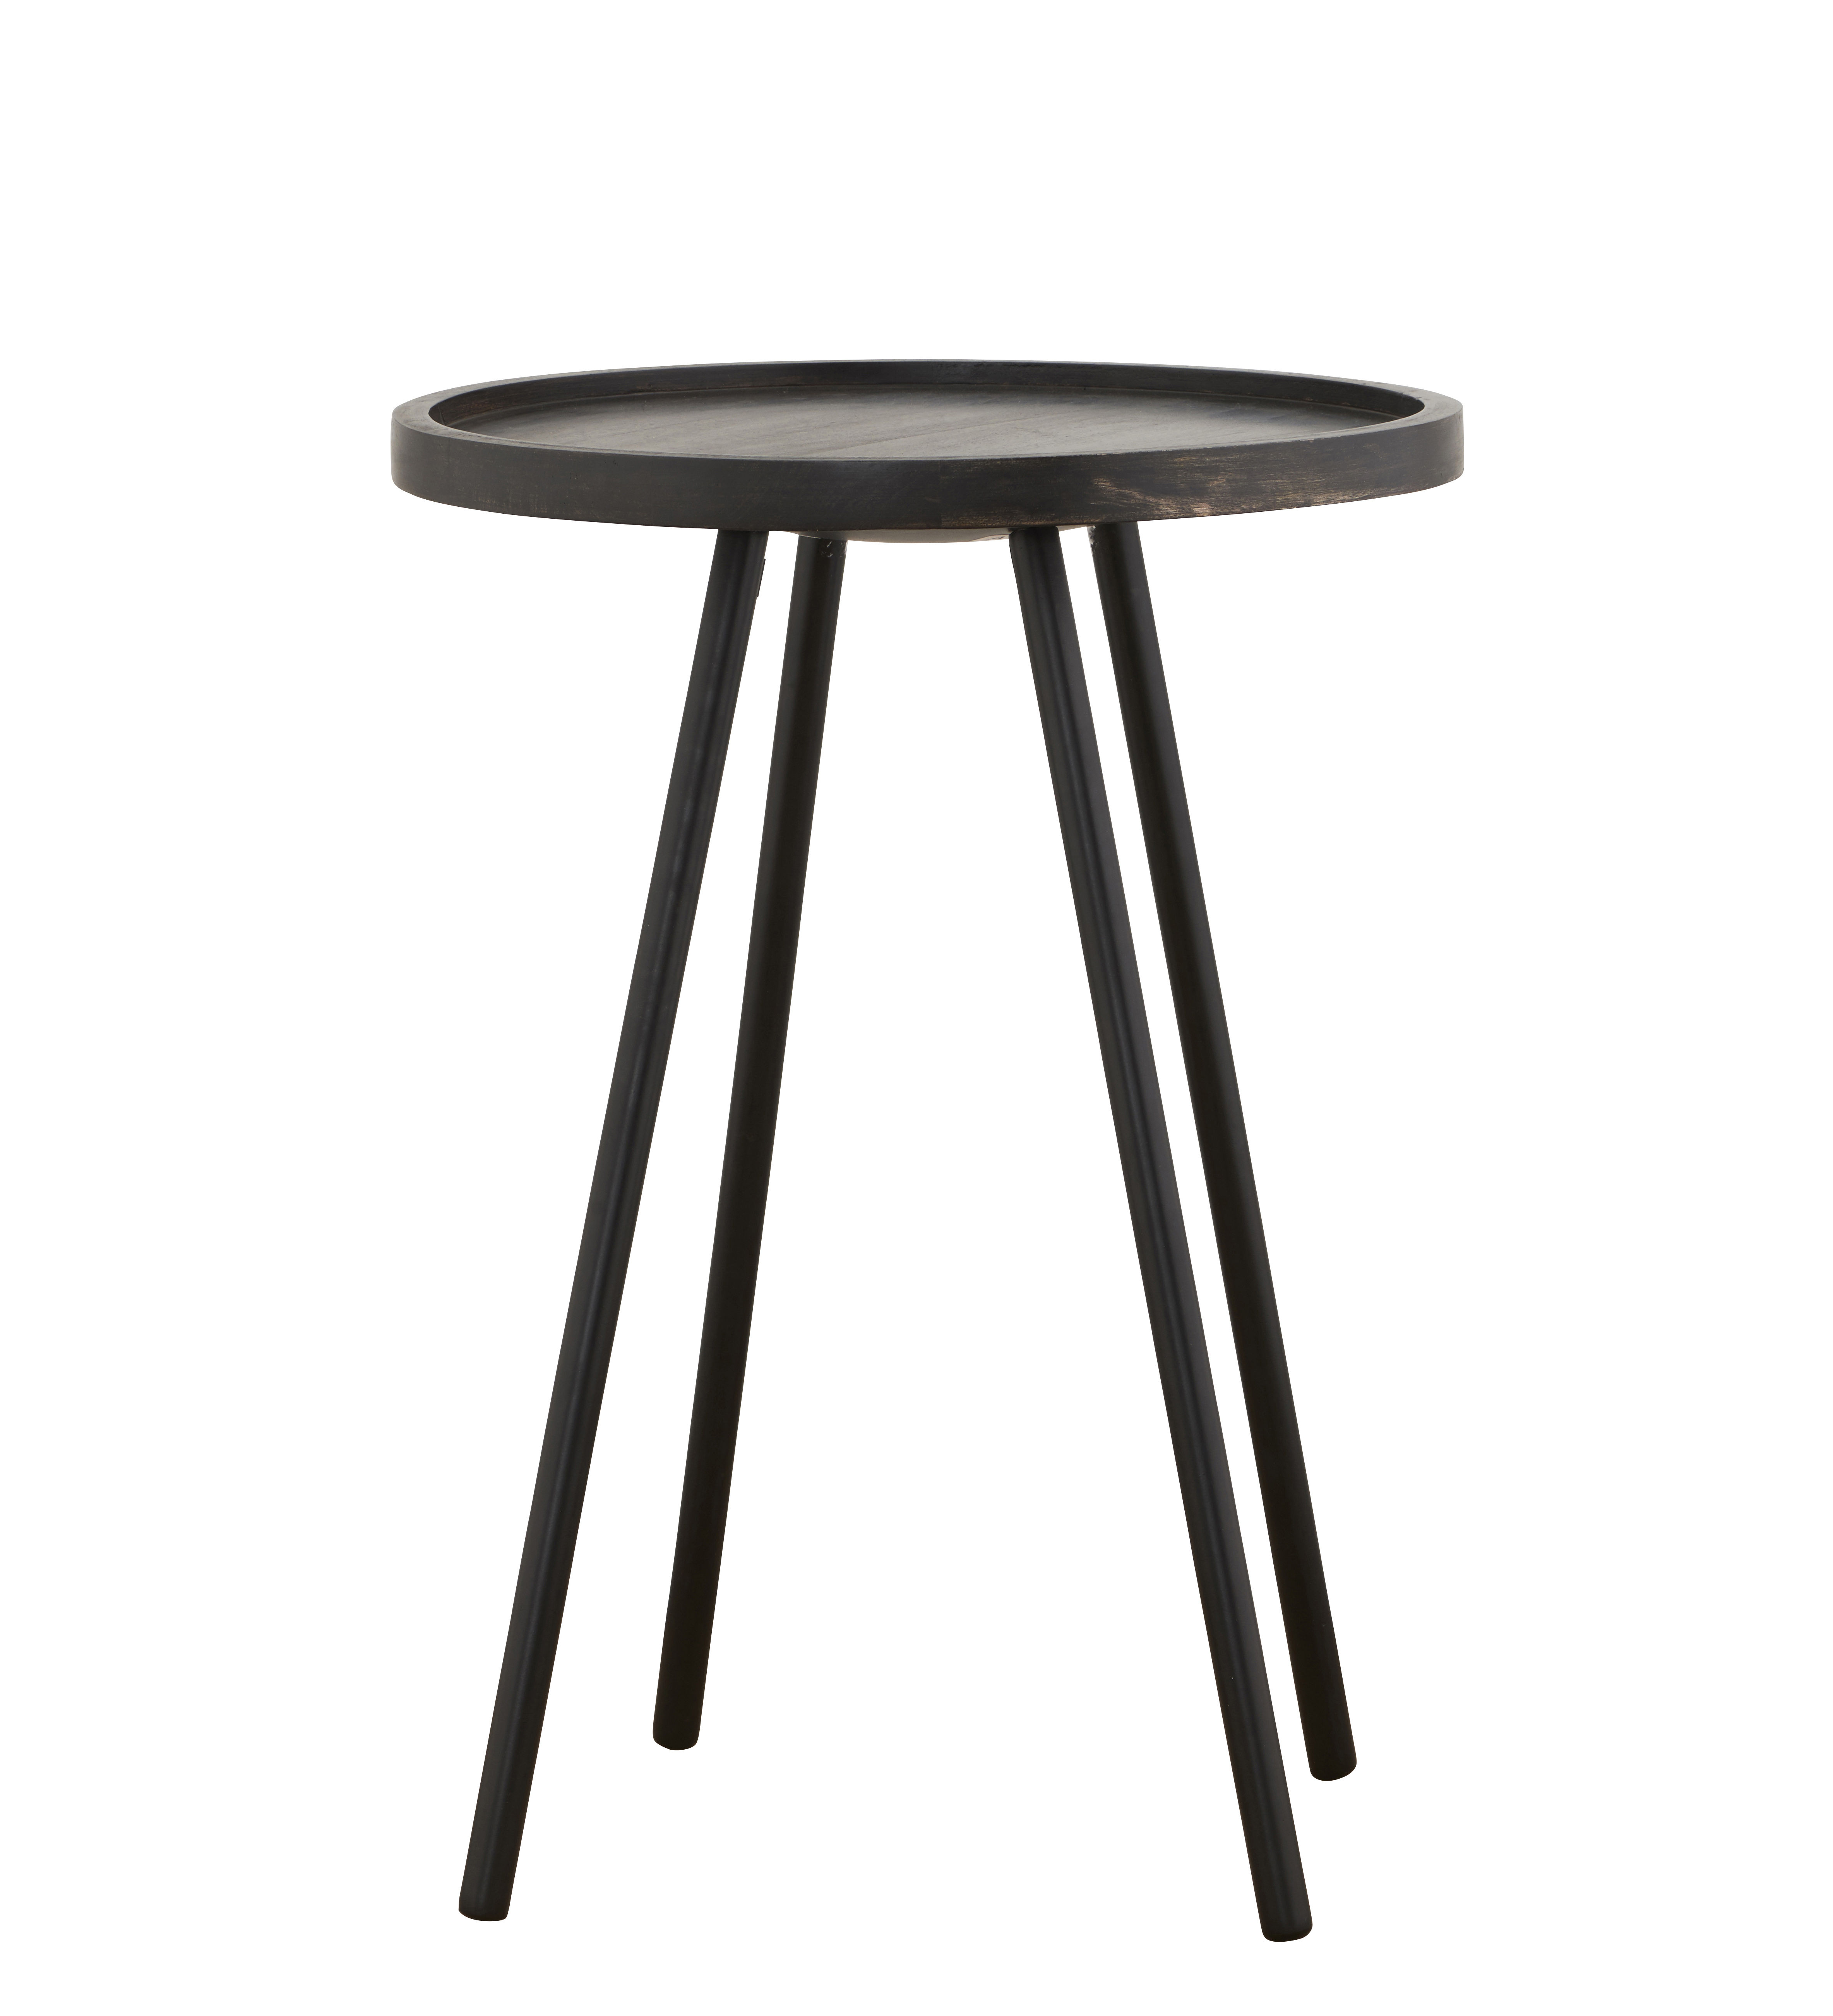 Arredamento - Tavolini  - Tavolino basso Juco / Ø 40 x H 55 cm - House Doctor - Ø 40 x H 55 cm / Nero patinato - Bois de manguier teinté, Ferro dipinto